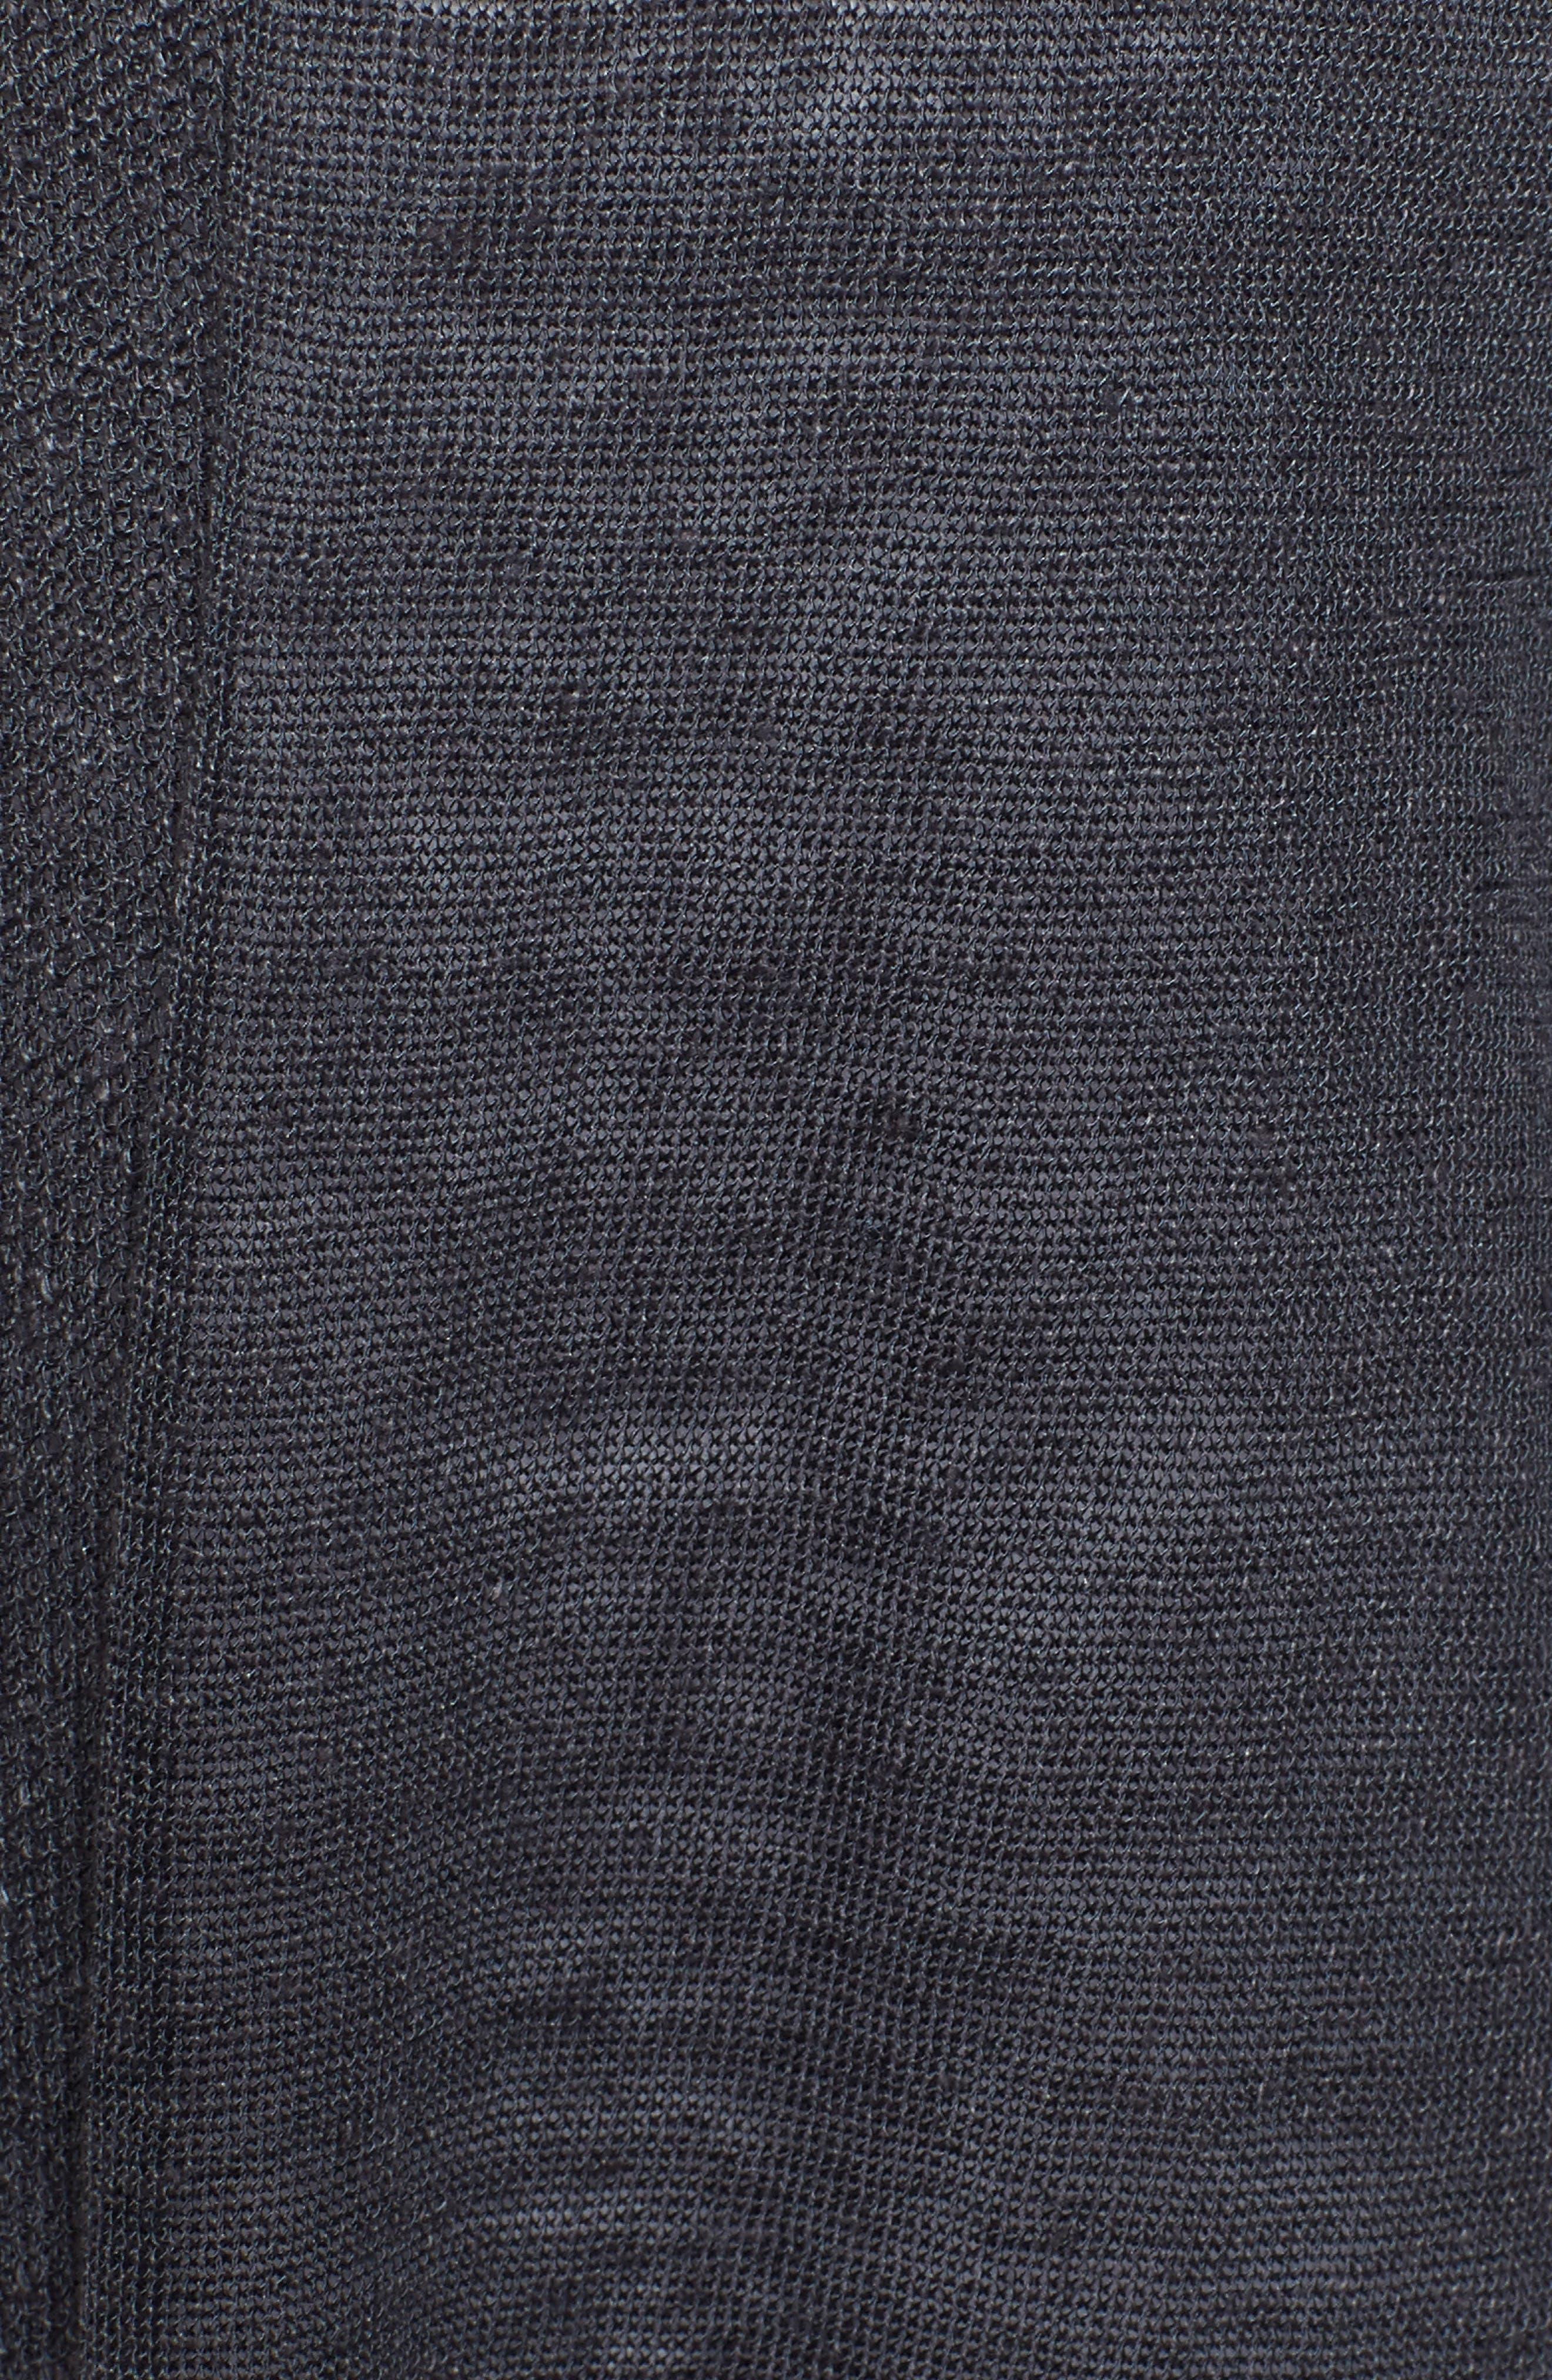 Long Linen Blend Cardigan,                             Alternate thumbnail 6, color,                             099